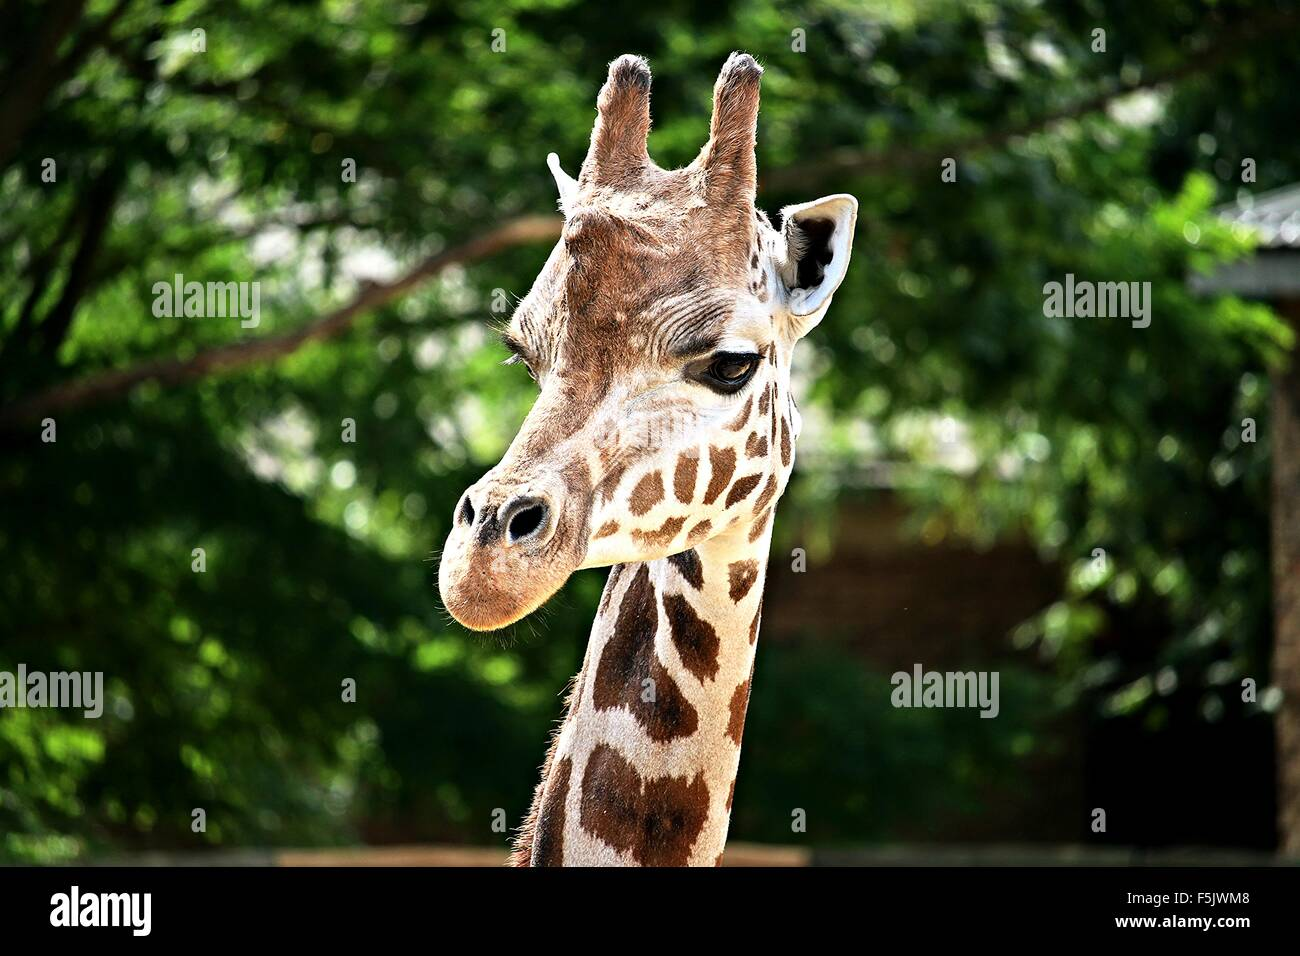 Magnifique portrait - Tête de Girafe Girafe Photo Stock